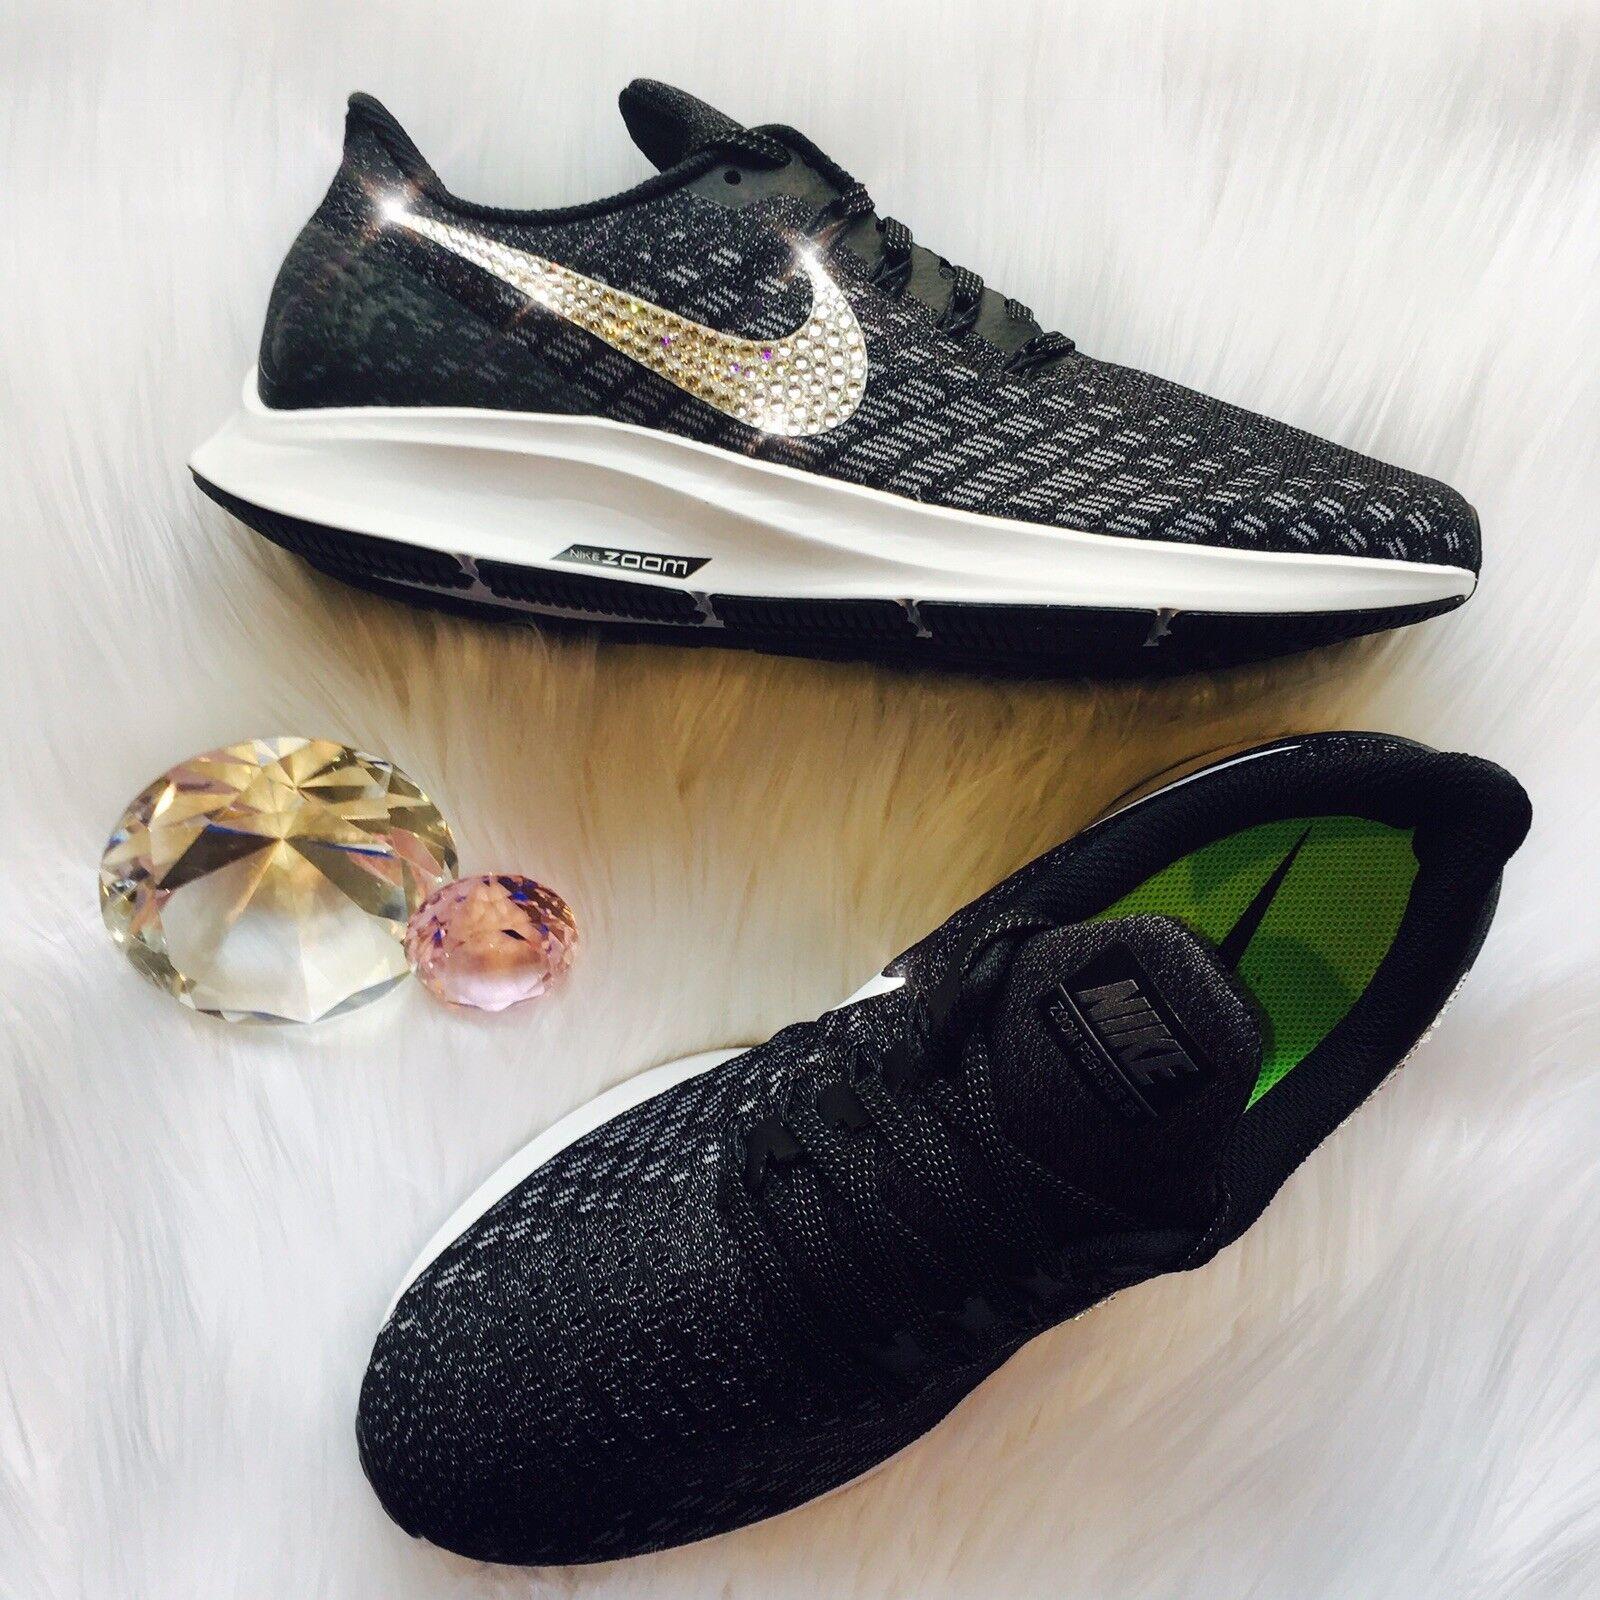 Bling Nike Air Zoom Zoom Zoom Pegasus 35 Donna  scarpe w  Swarovski Crystal Swoosh - nero 5ff38d